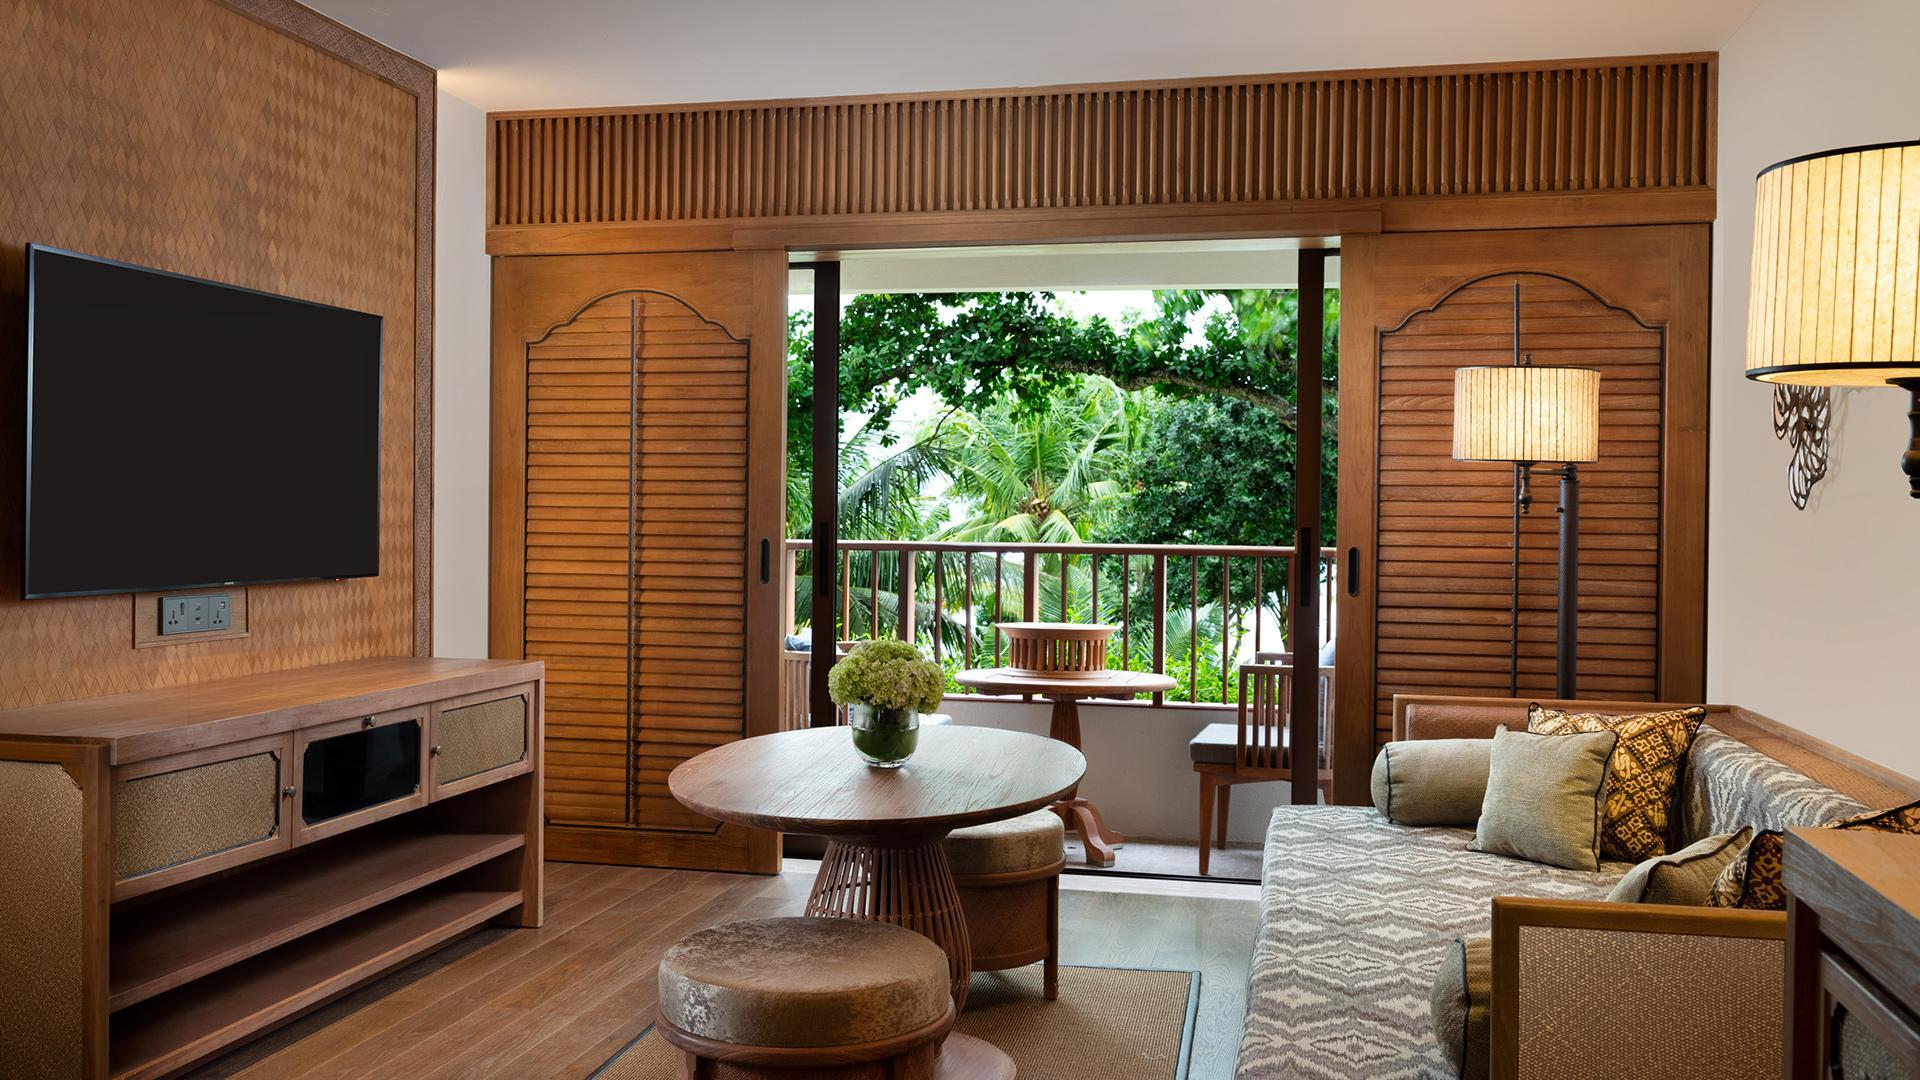 Family Suite image 1 at Hyatt Regency Bali by Kota Denpasar, Bali, Indonesia